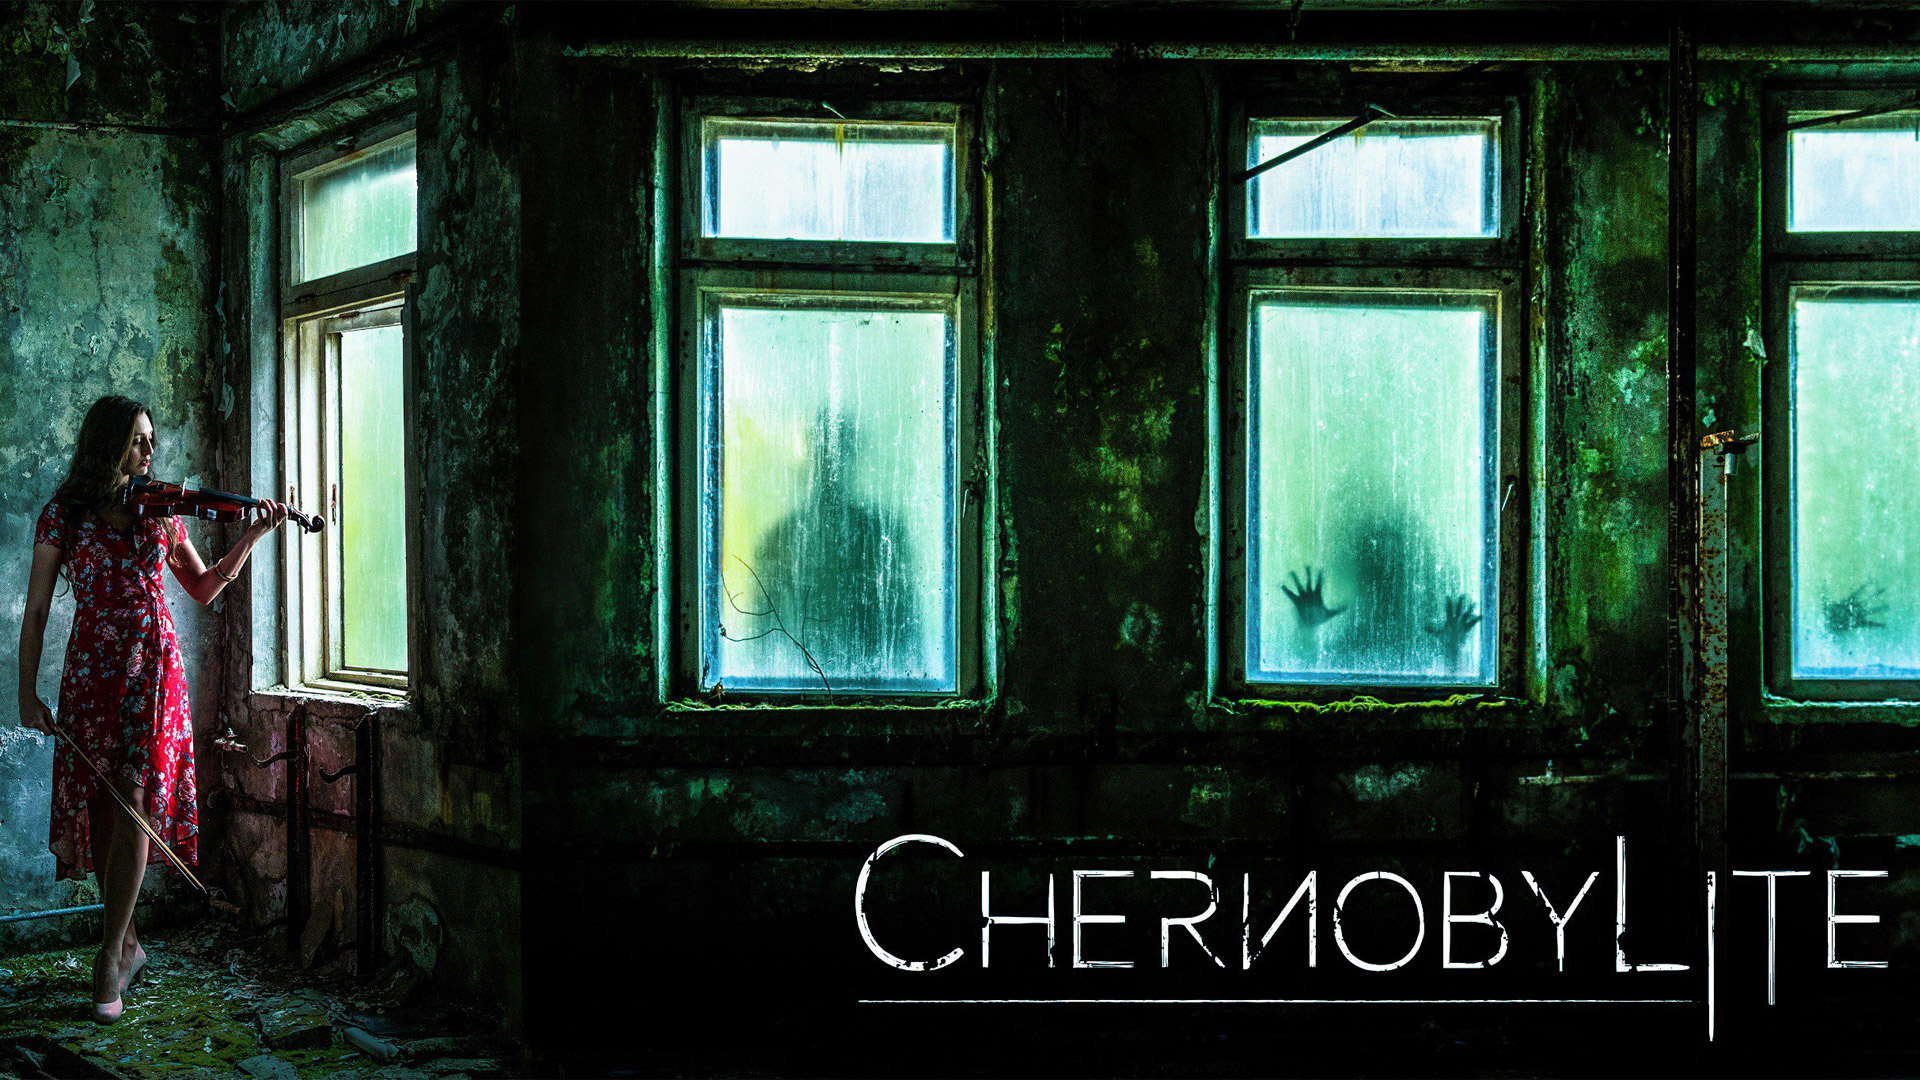 Free Chernobylite Wallpaper in 1920x1080